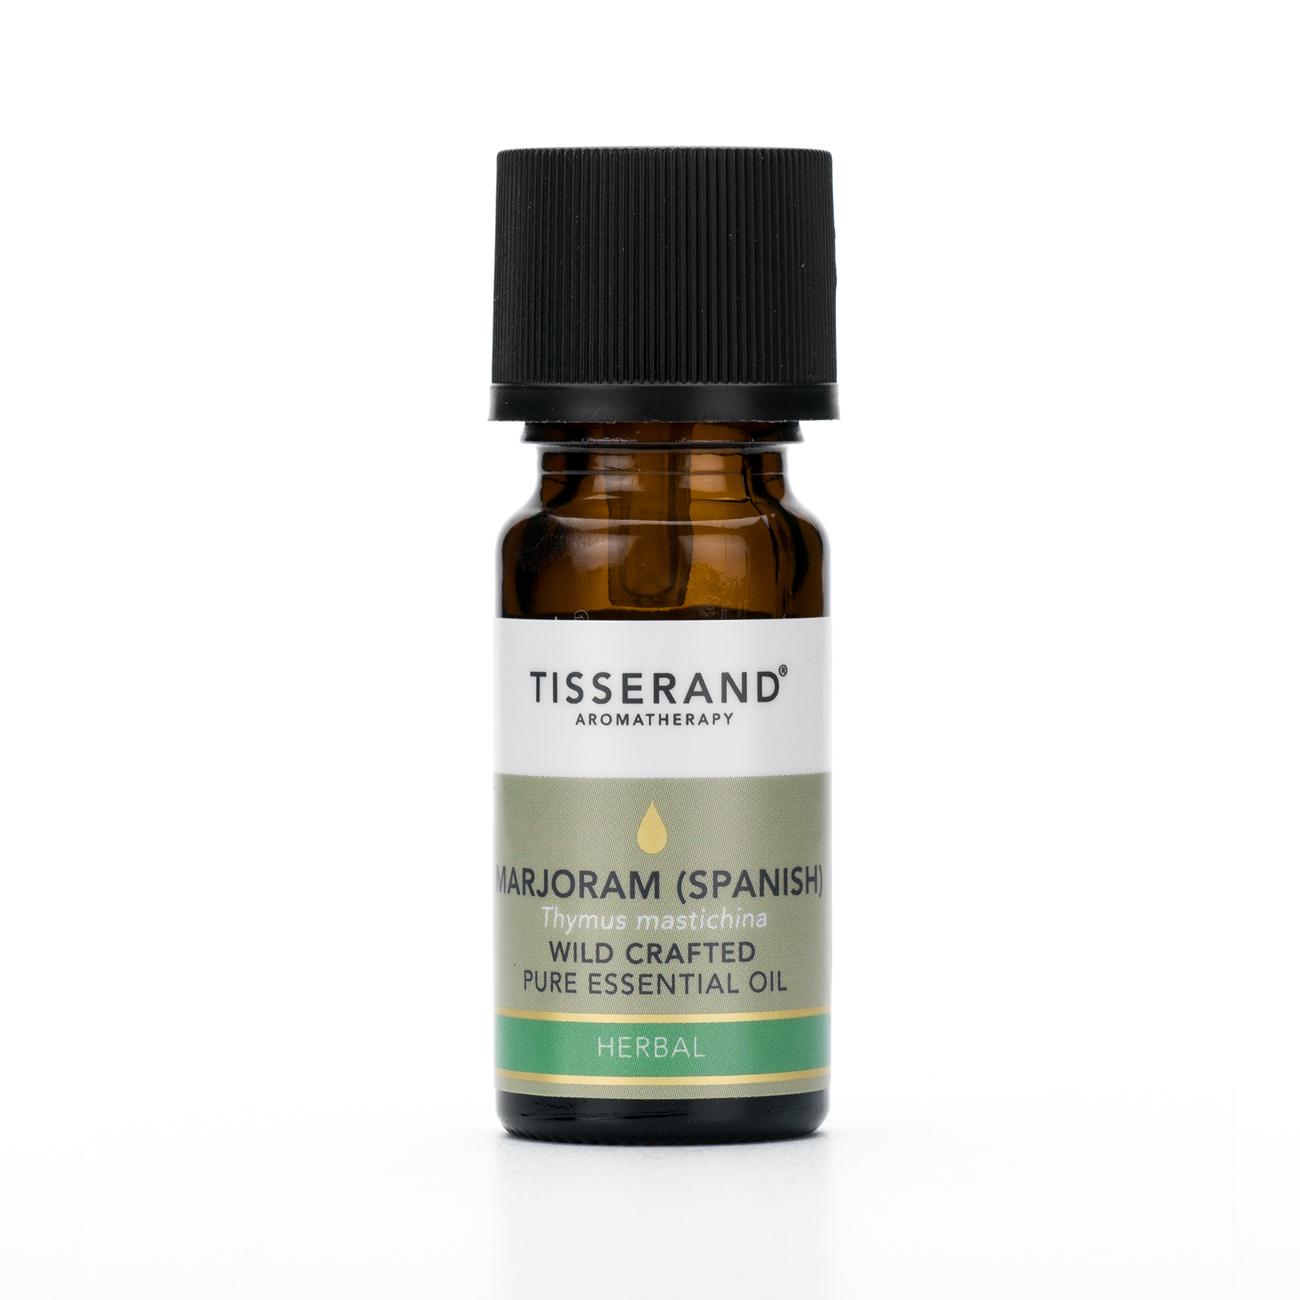 Wild Crafted Marjoram (Spanish) Pure Essential Oil 9ml